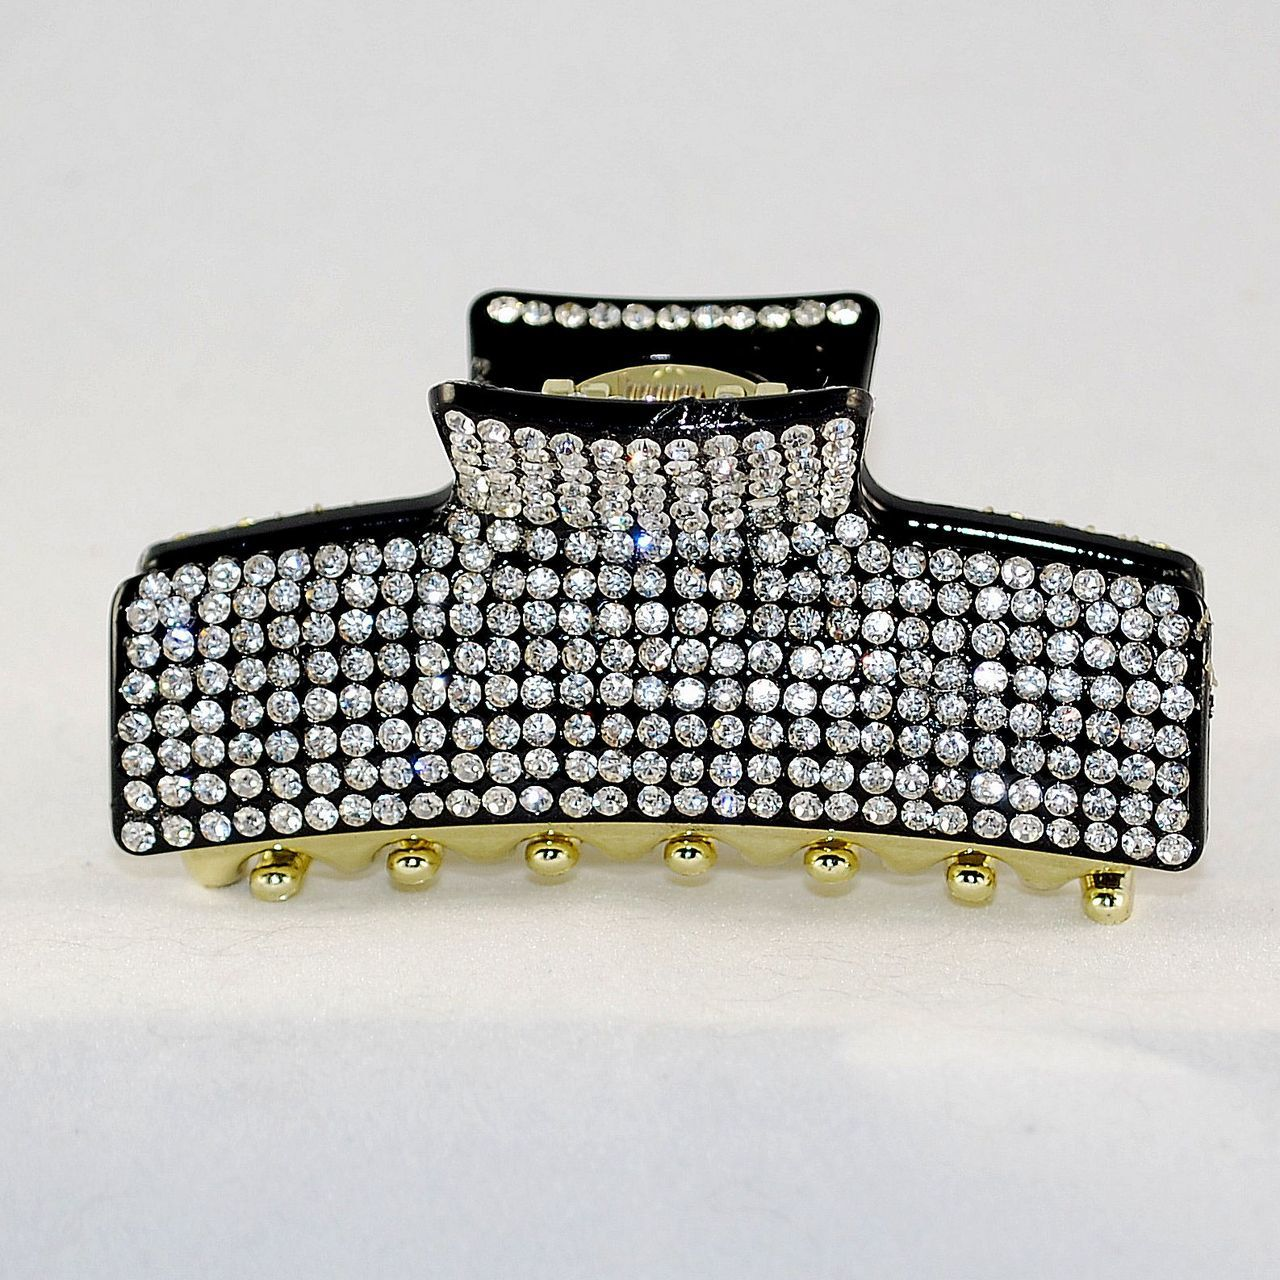 Enchanting Jewelry Creations image 60